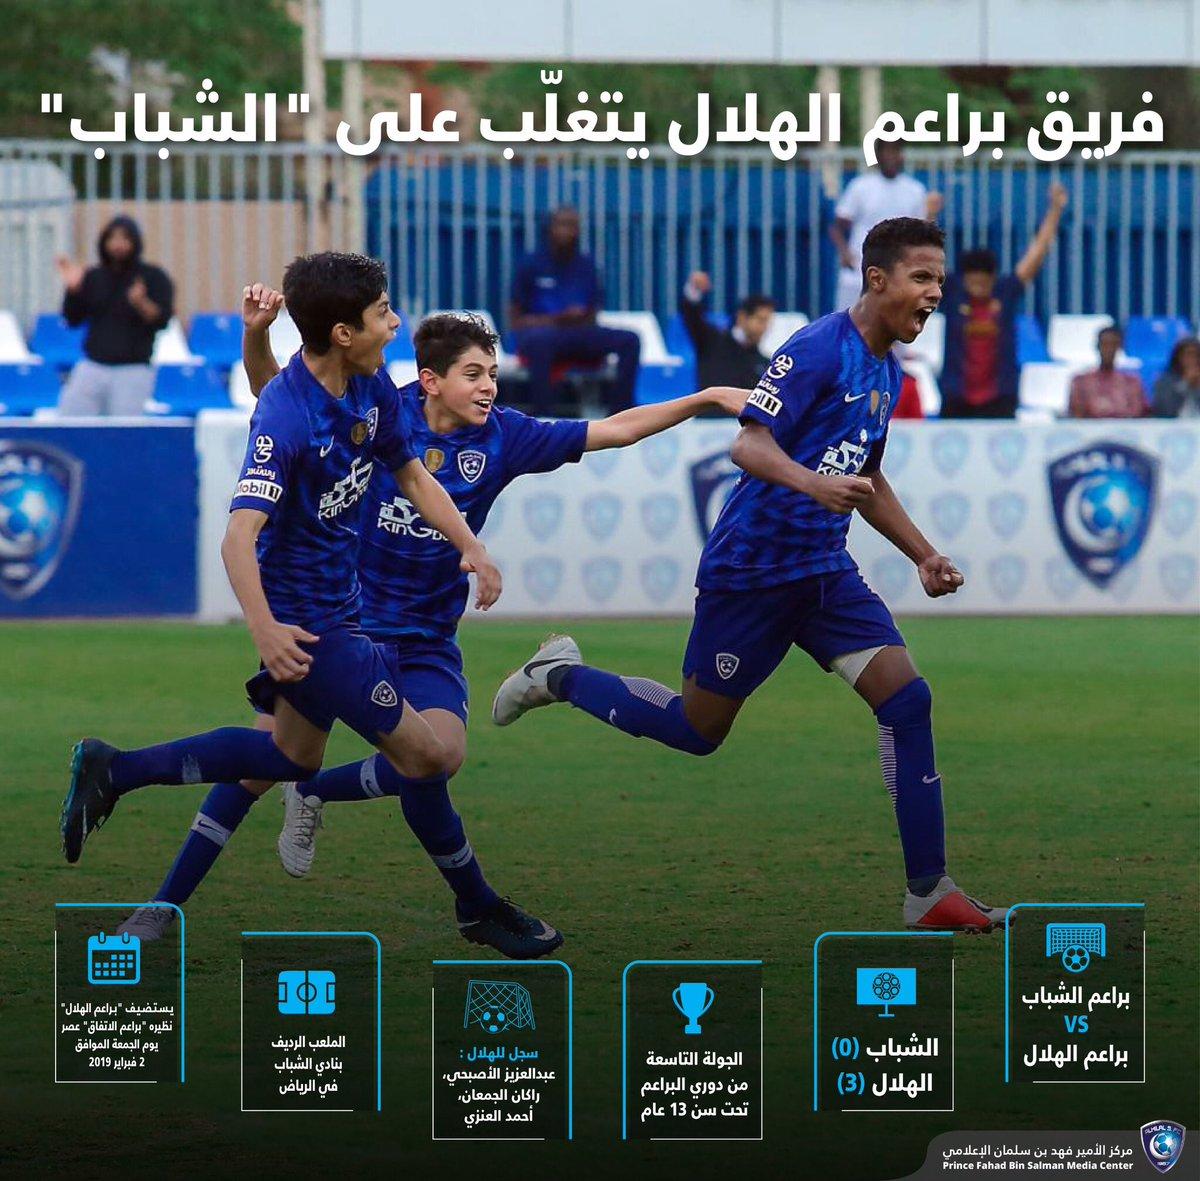 Twitter पर نادي الهلال السعودي: ⚽ براعم الهلال لكرة القدم يكسبون نظيرهم الشباببثلاثية انفوجرافيك_الهلال…